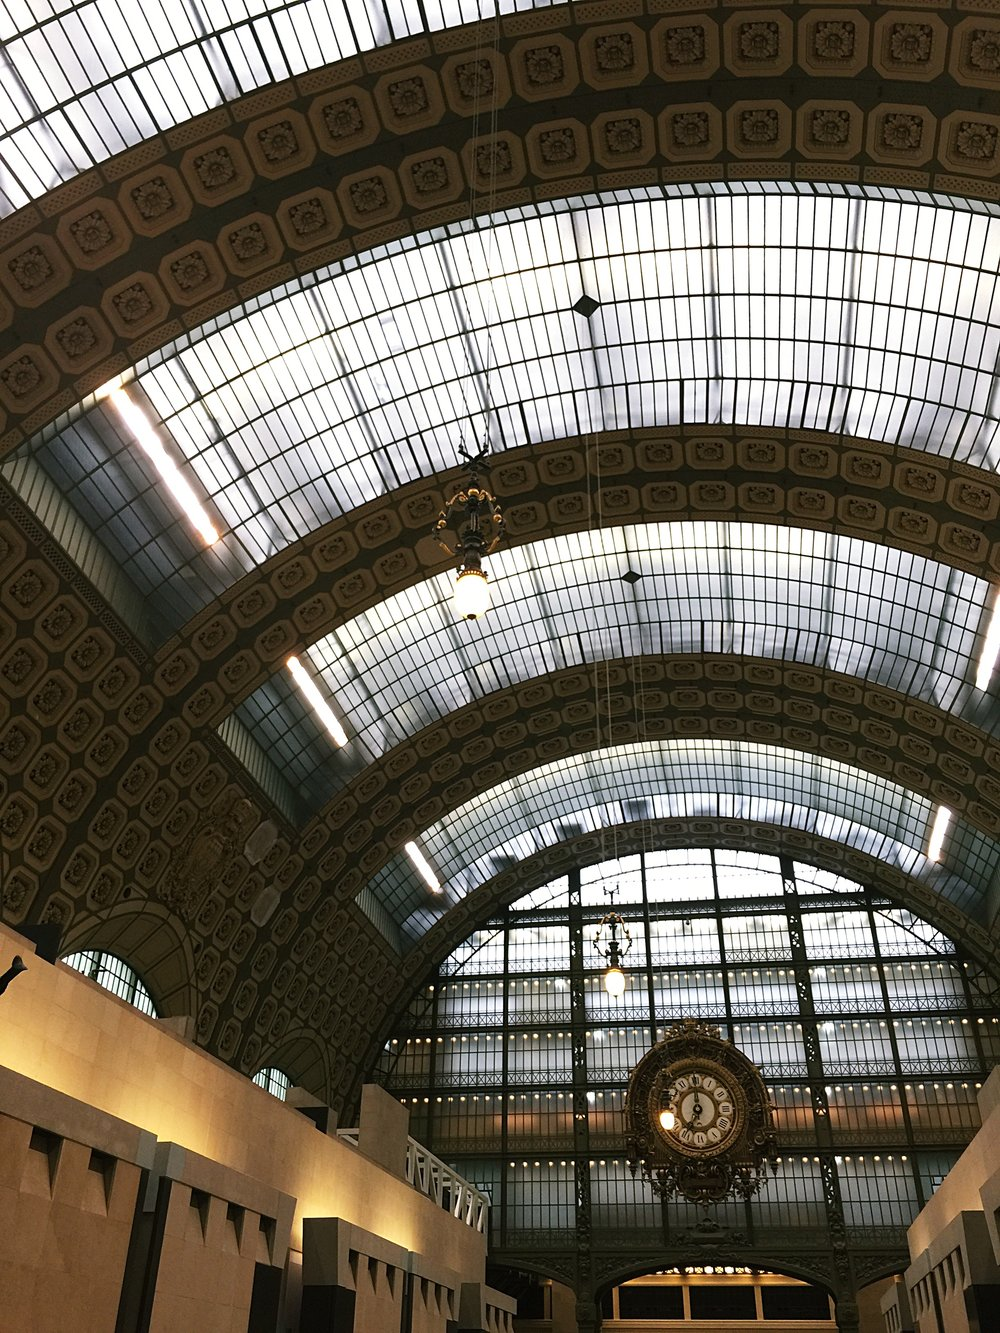 My favorite - Musée d'Orsay!